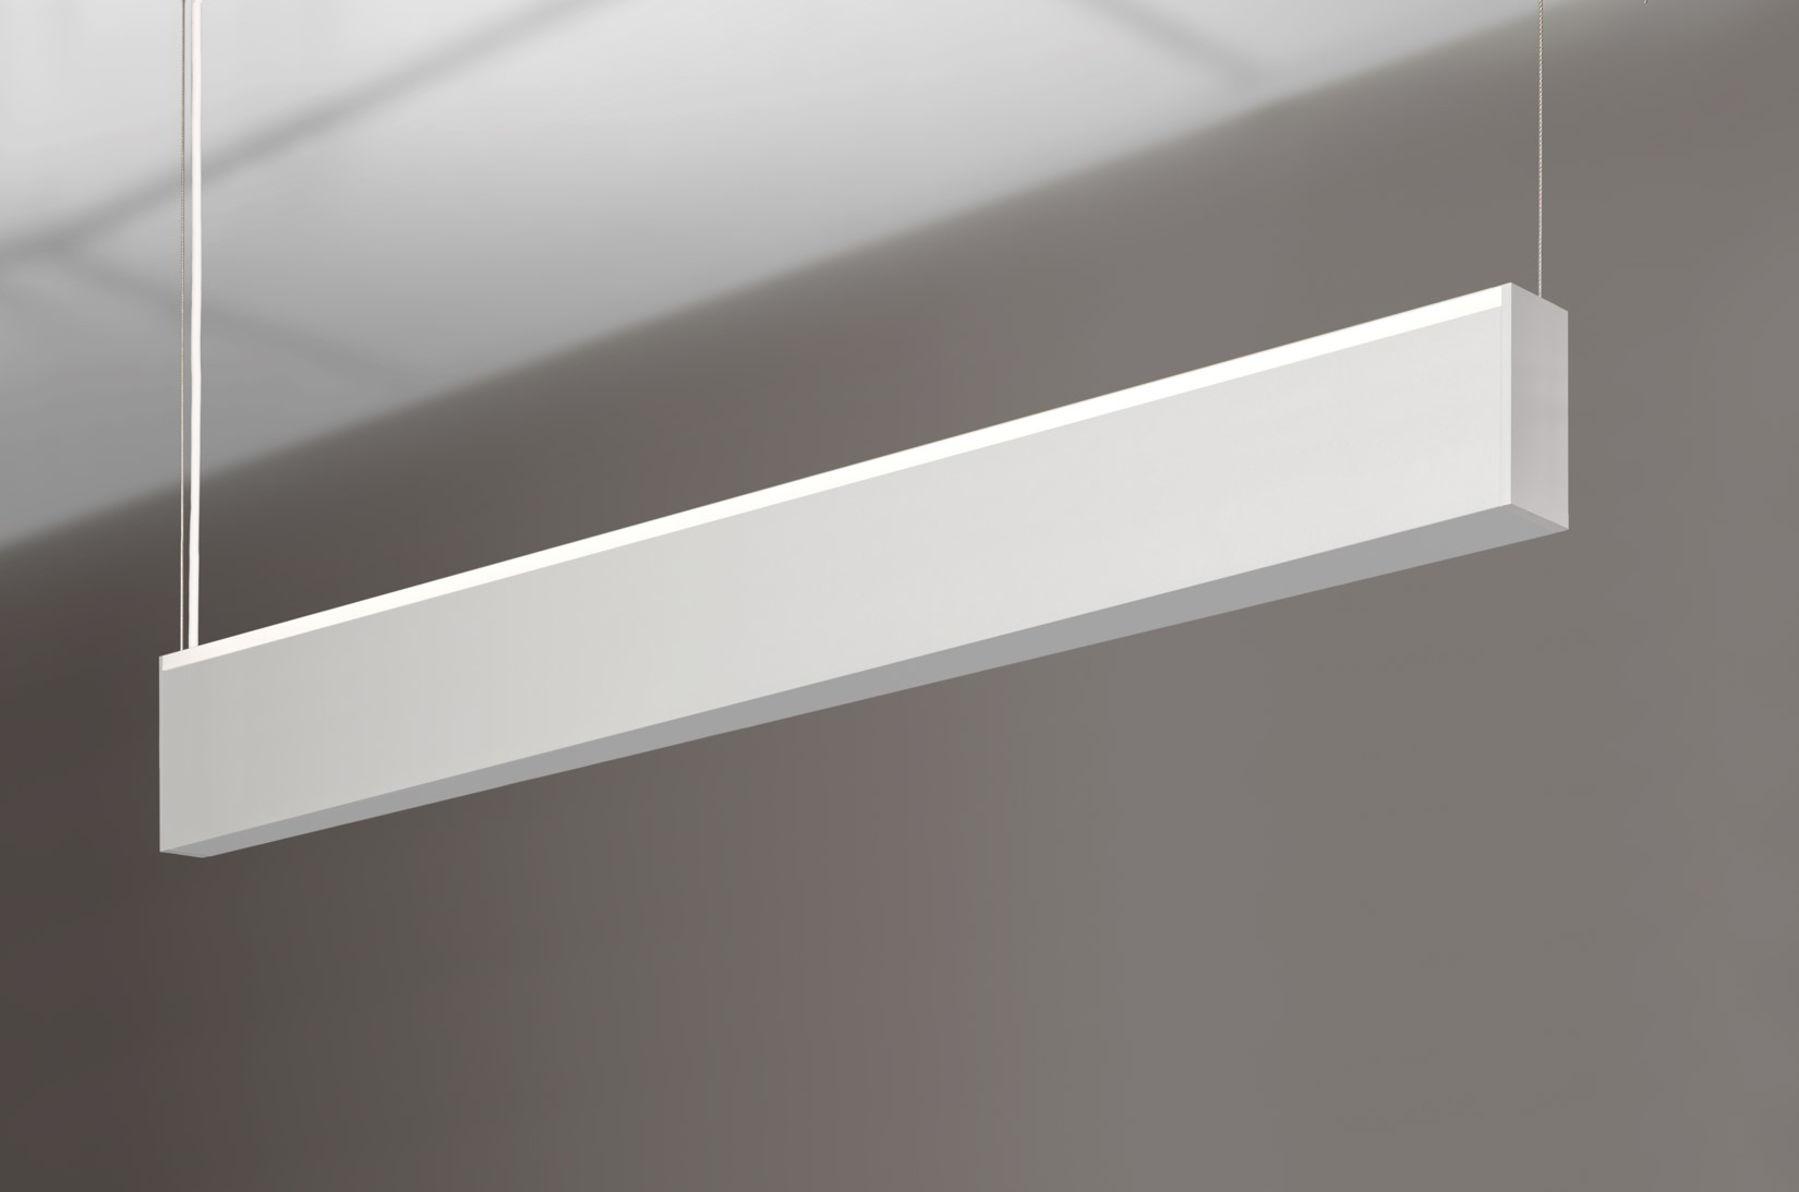 Picture of GX3D13U2-LED-LENS3D